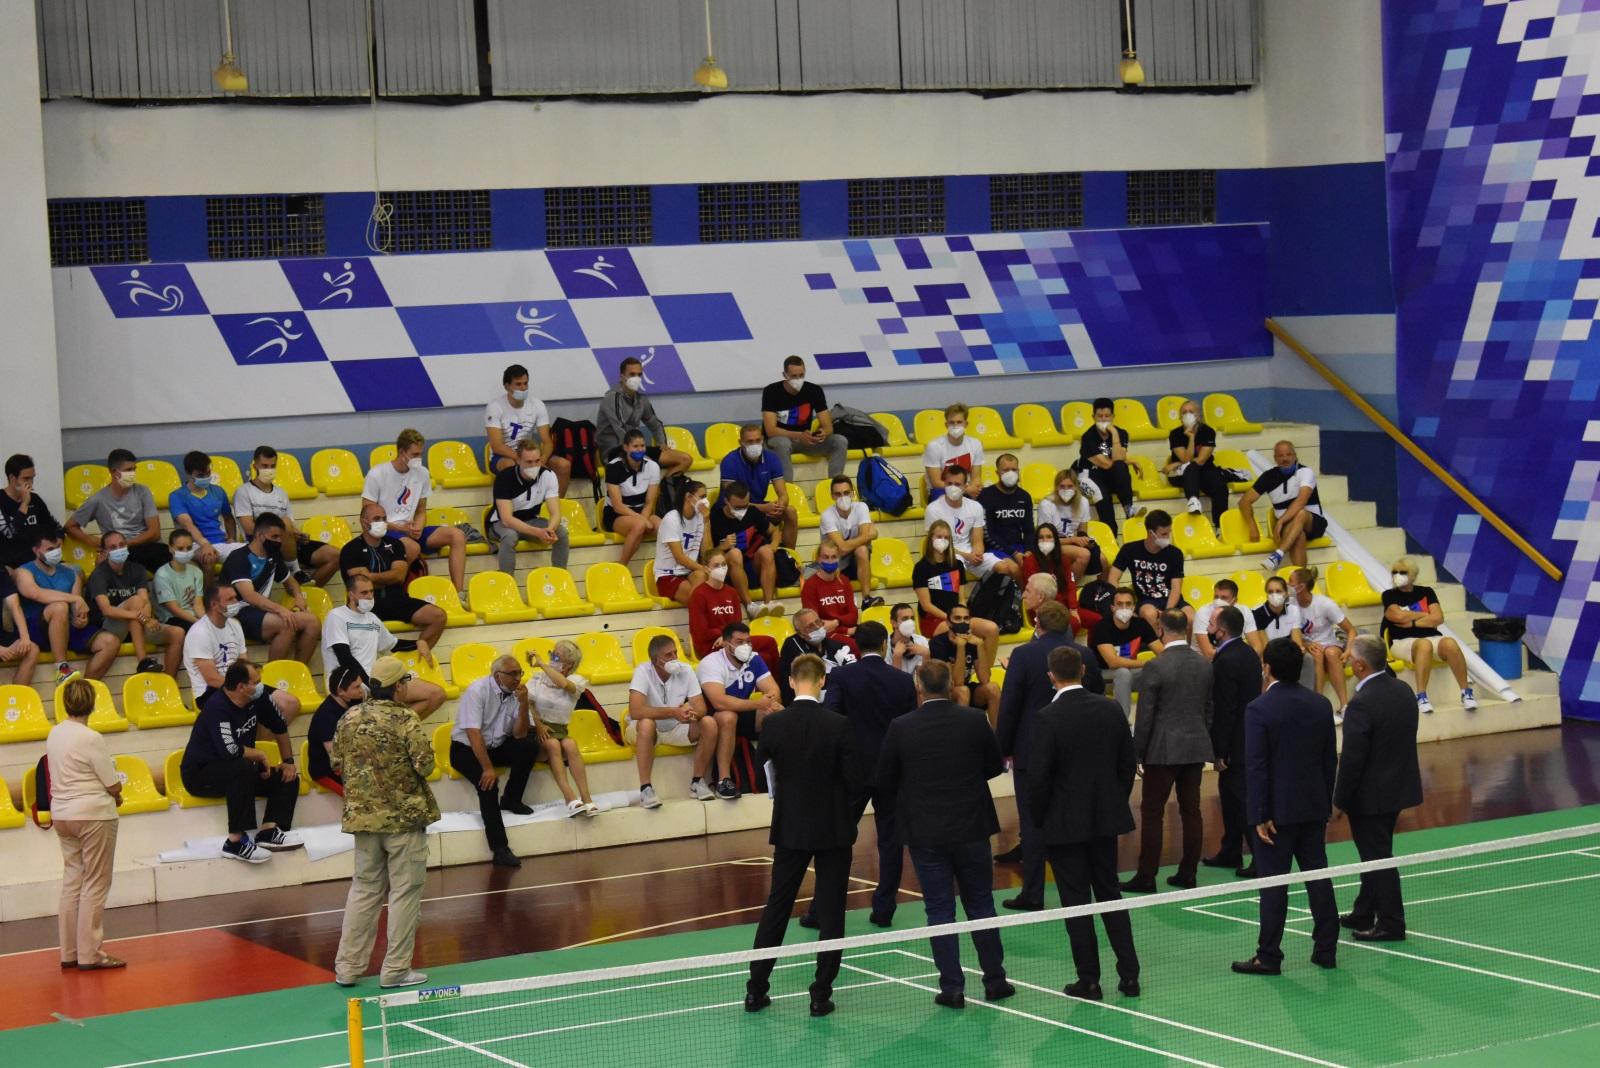 Олимпиада Олимпийские игры Матыцин Токио 2020 Япония отмена олимпиады